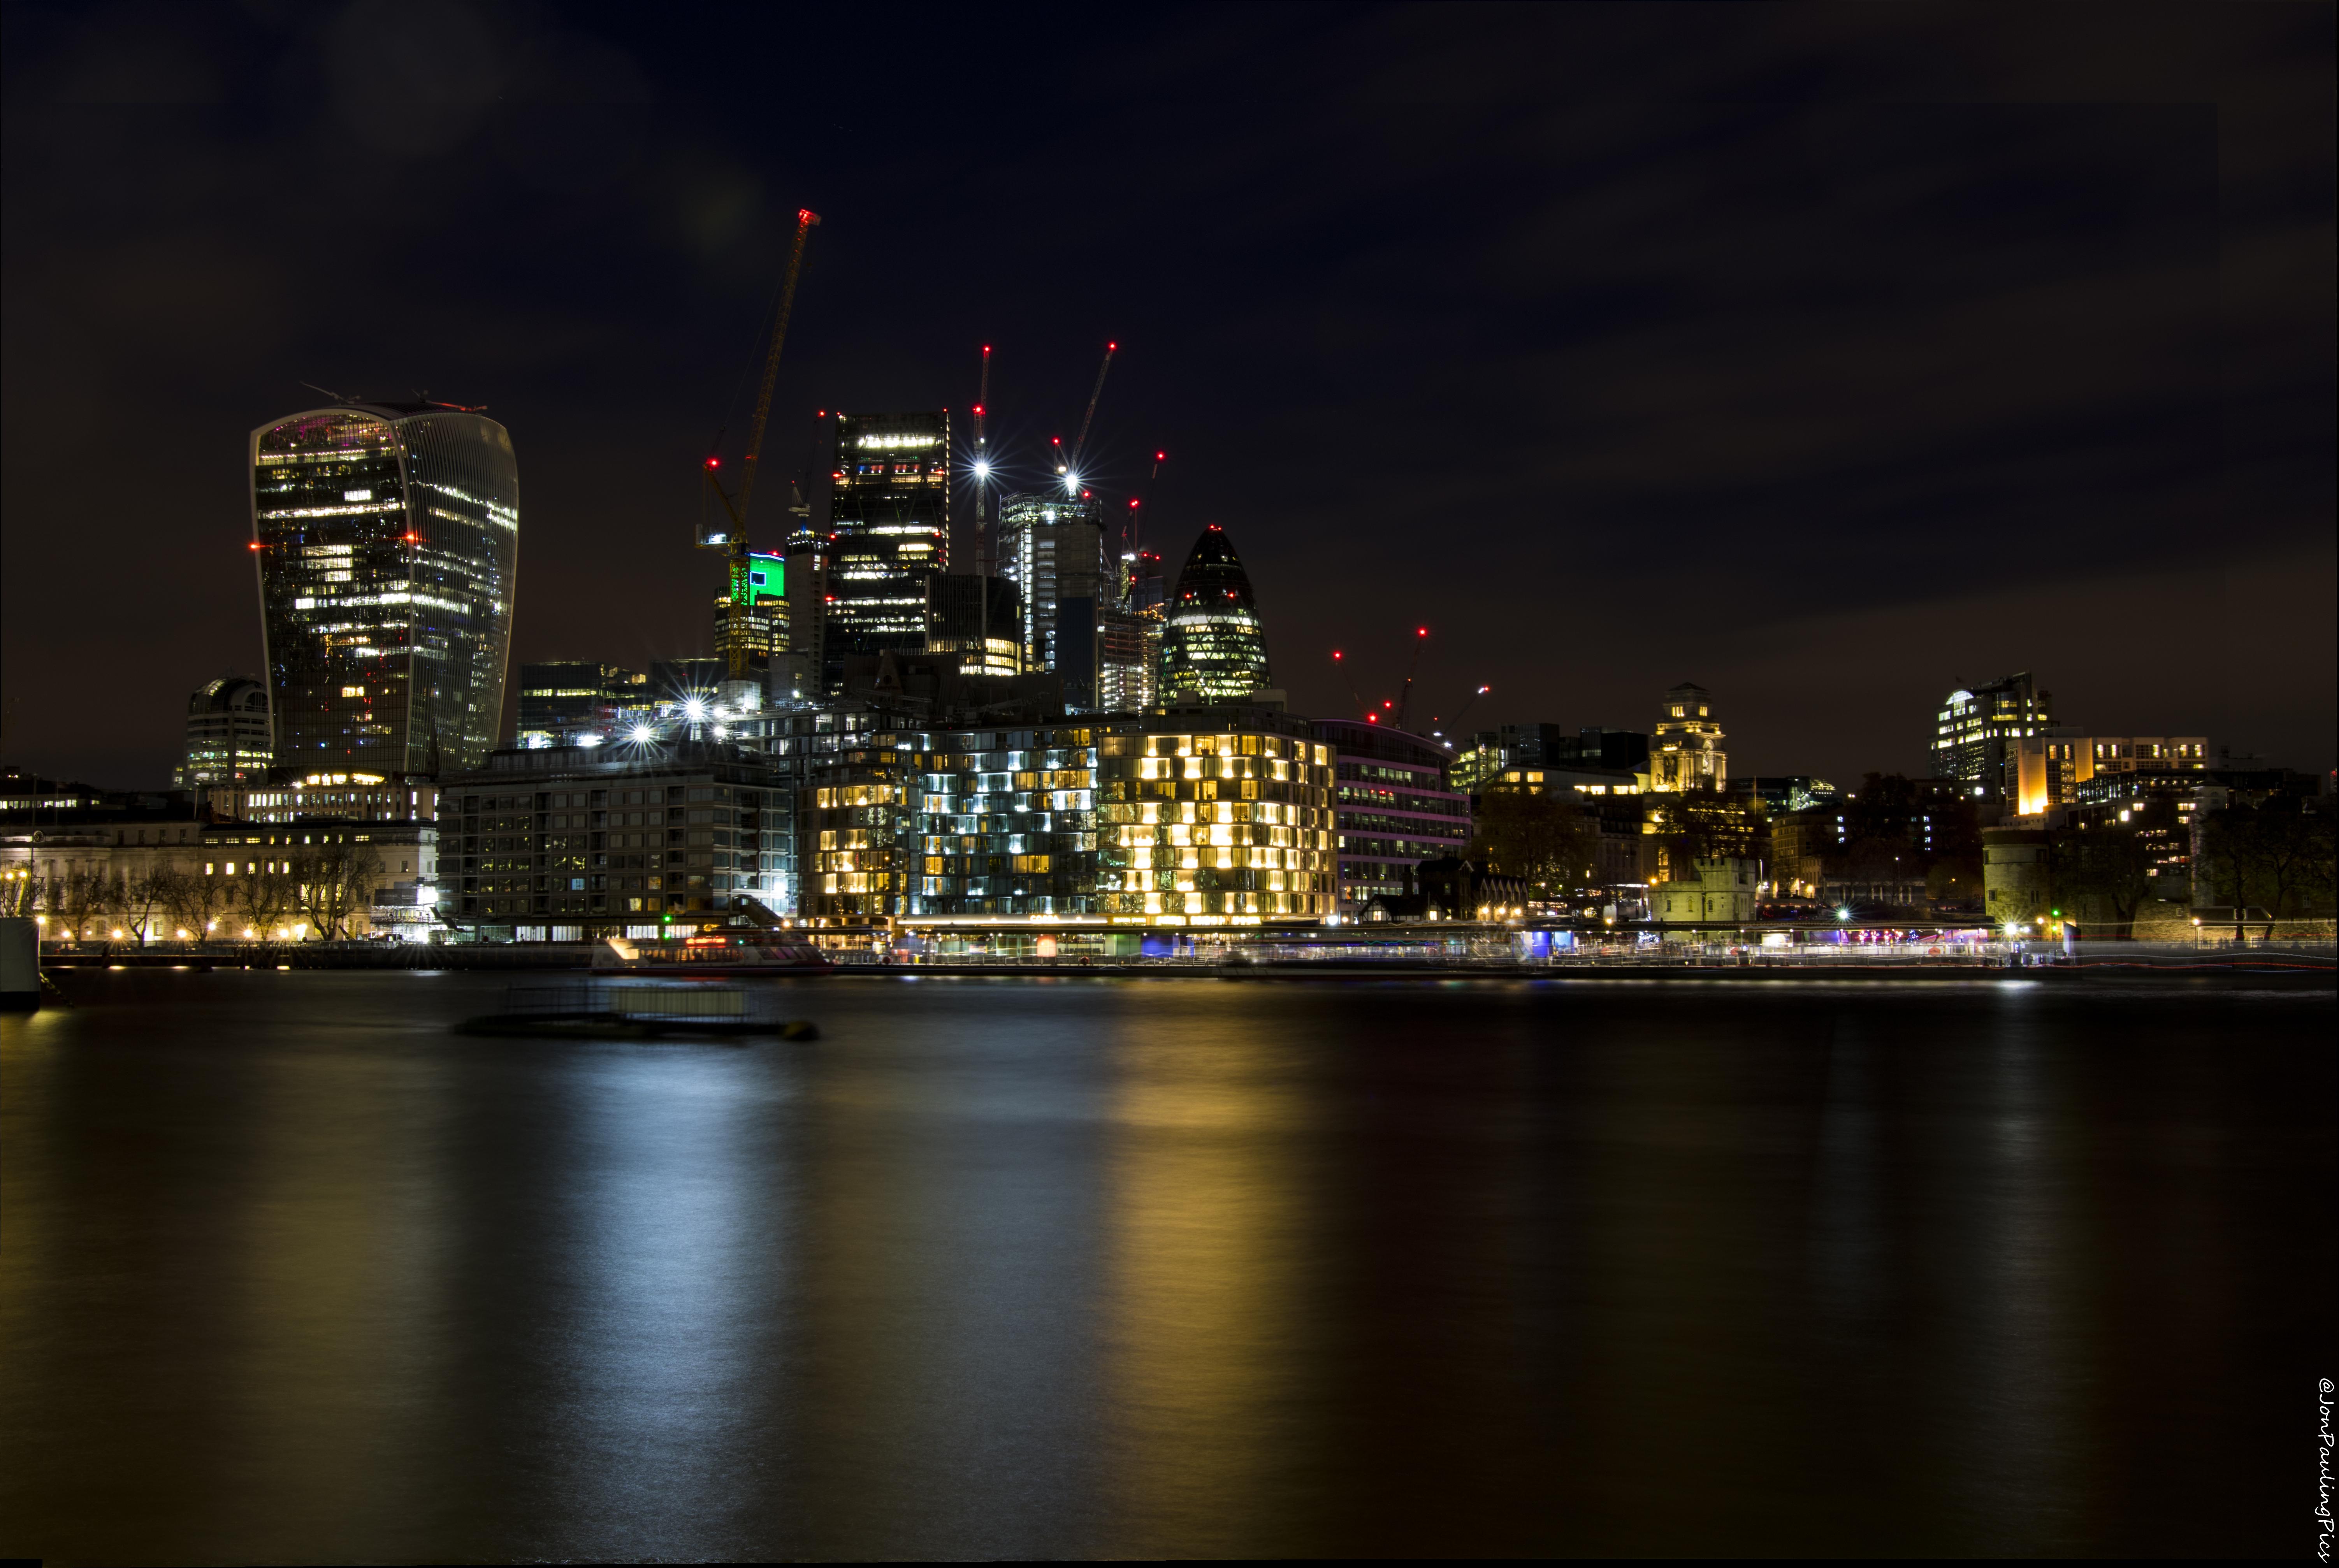 London Long Exposure Skyline by Mincingyoda